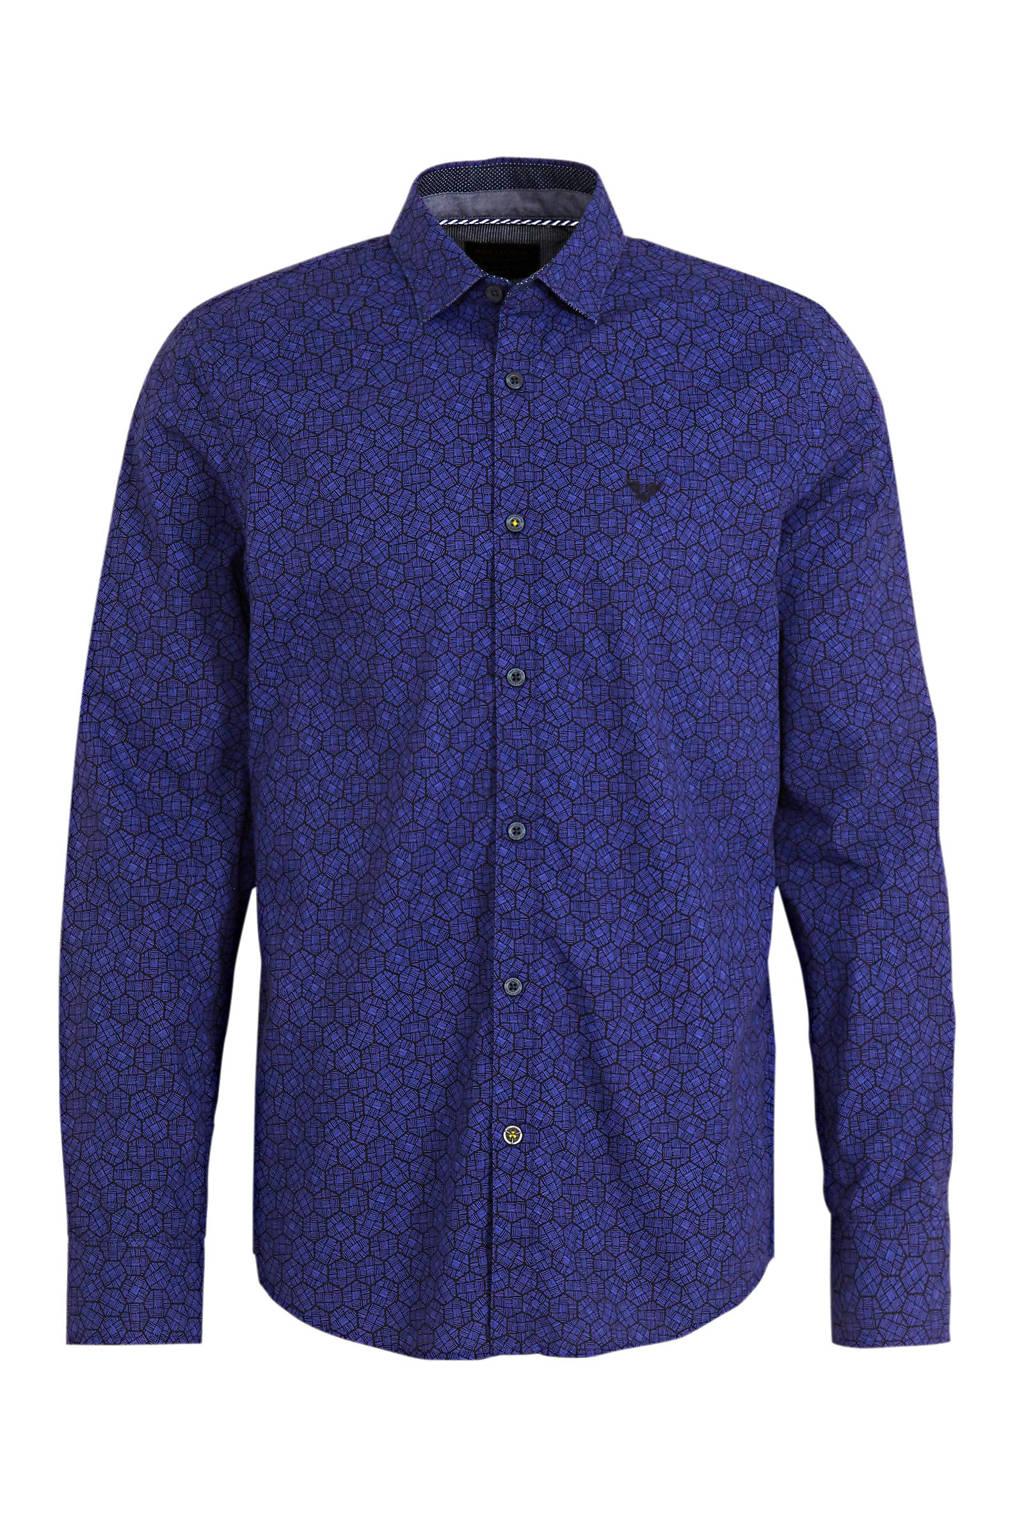 PME Legend regular fit overhemd met all over print paars, Paars